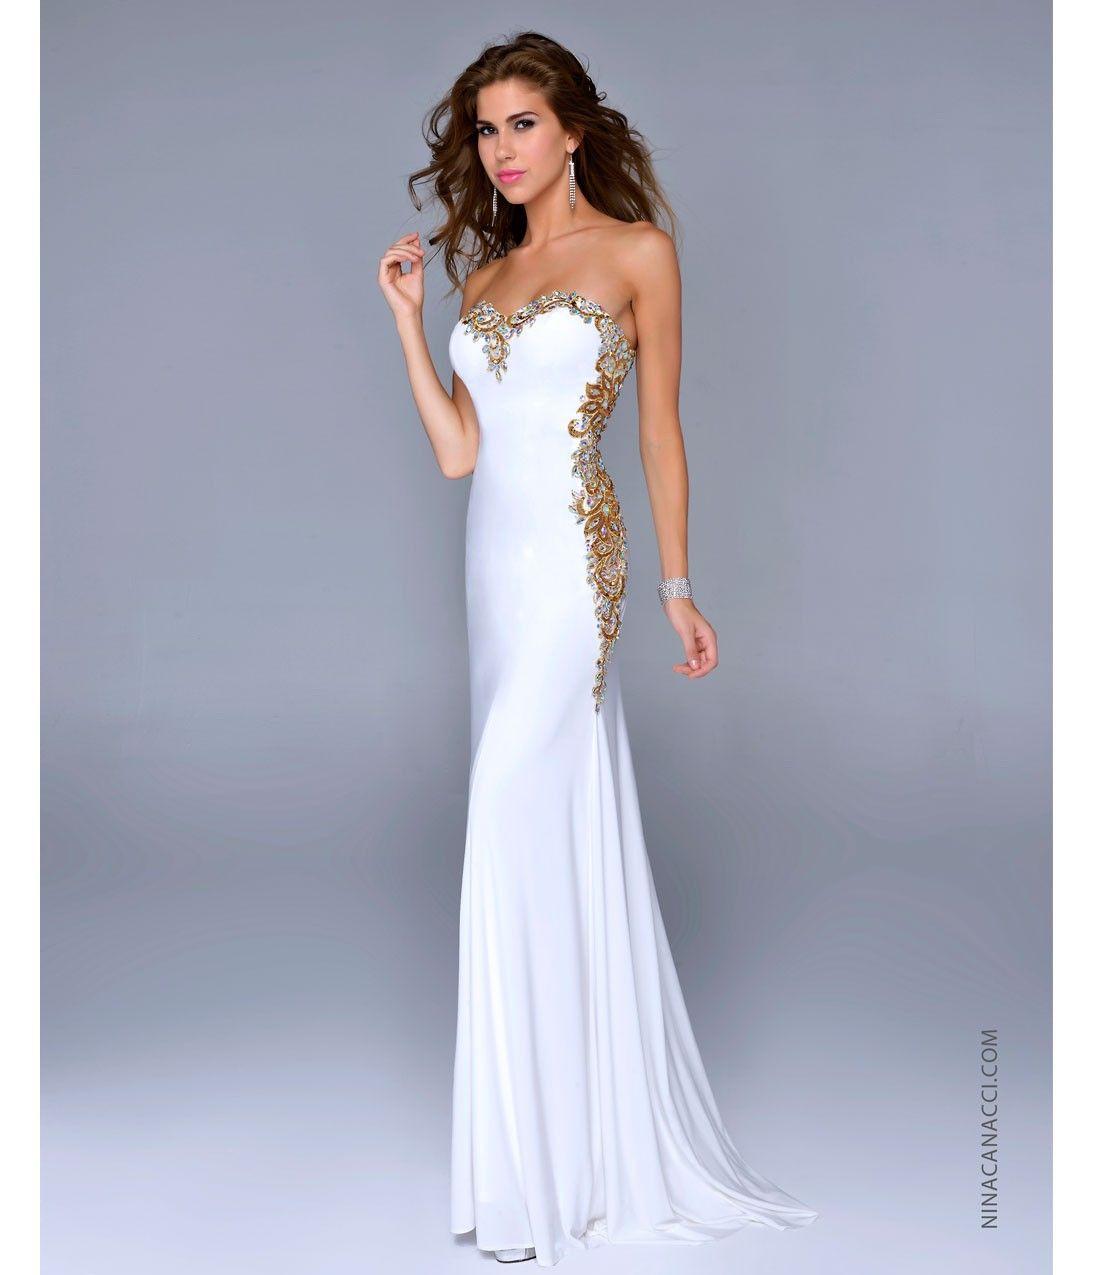 Fashion choice of white gold prom dresses photo album reikian